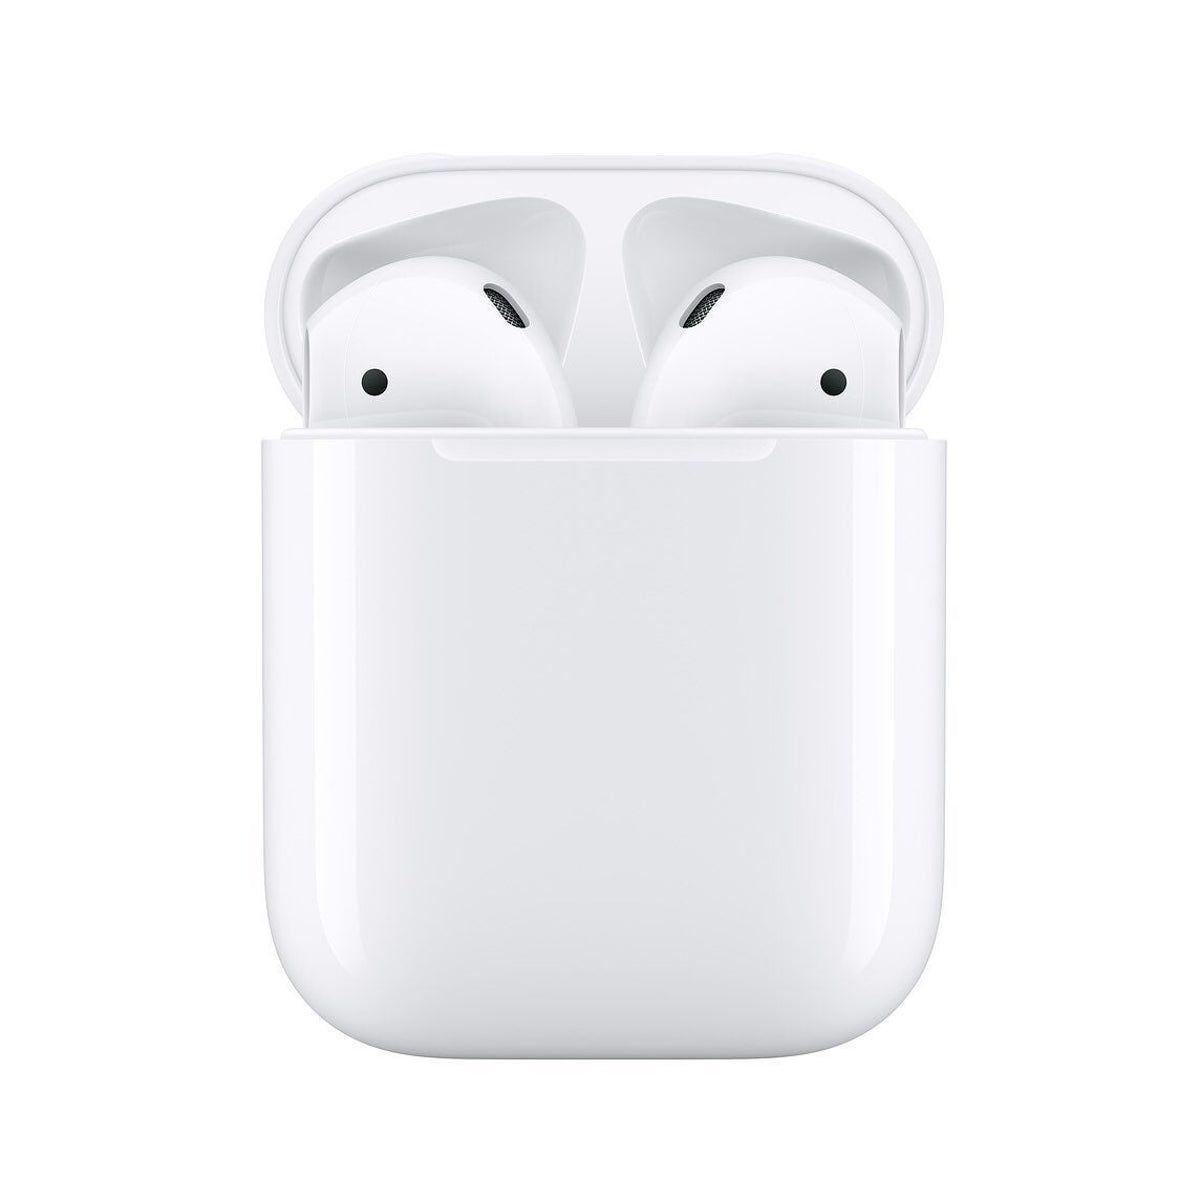 Apple Airpods 2nd Generation Wireless Earphones Apple Airpods 2 Bluetooth Headphones